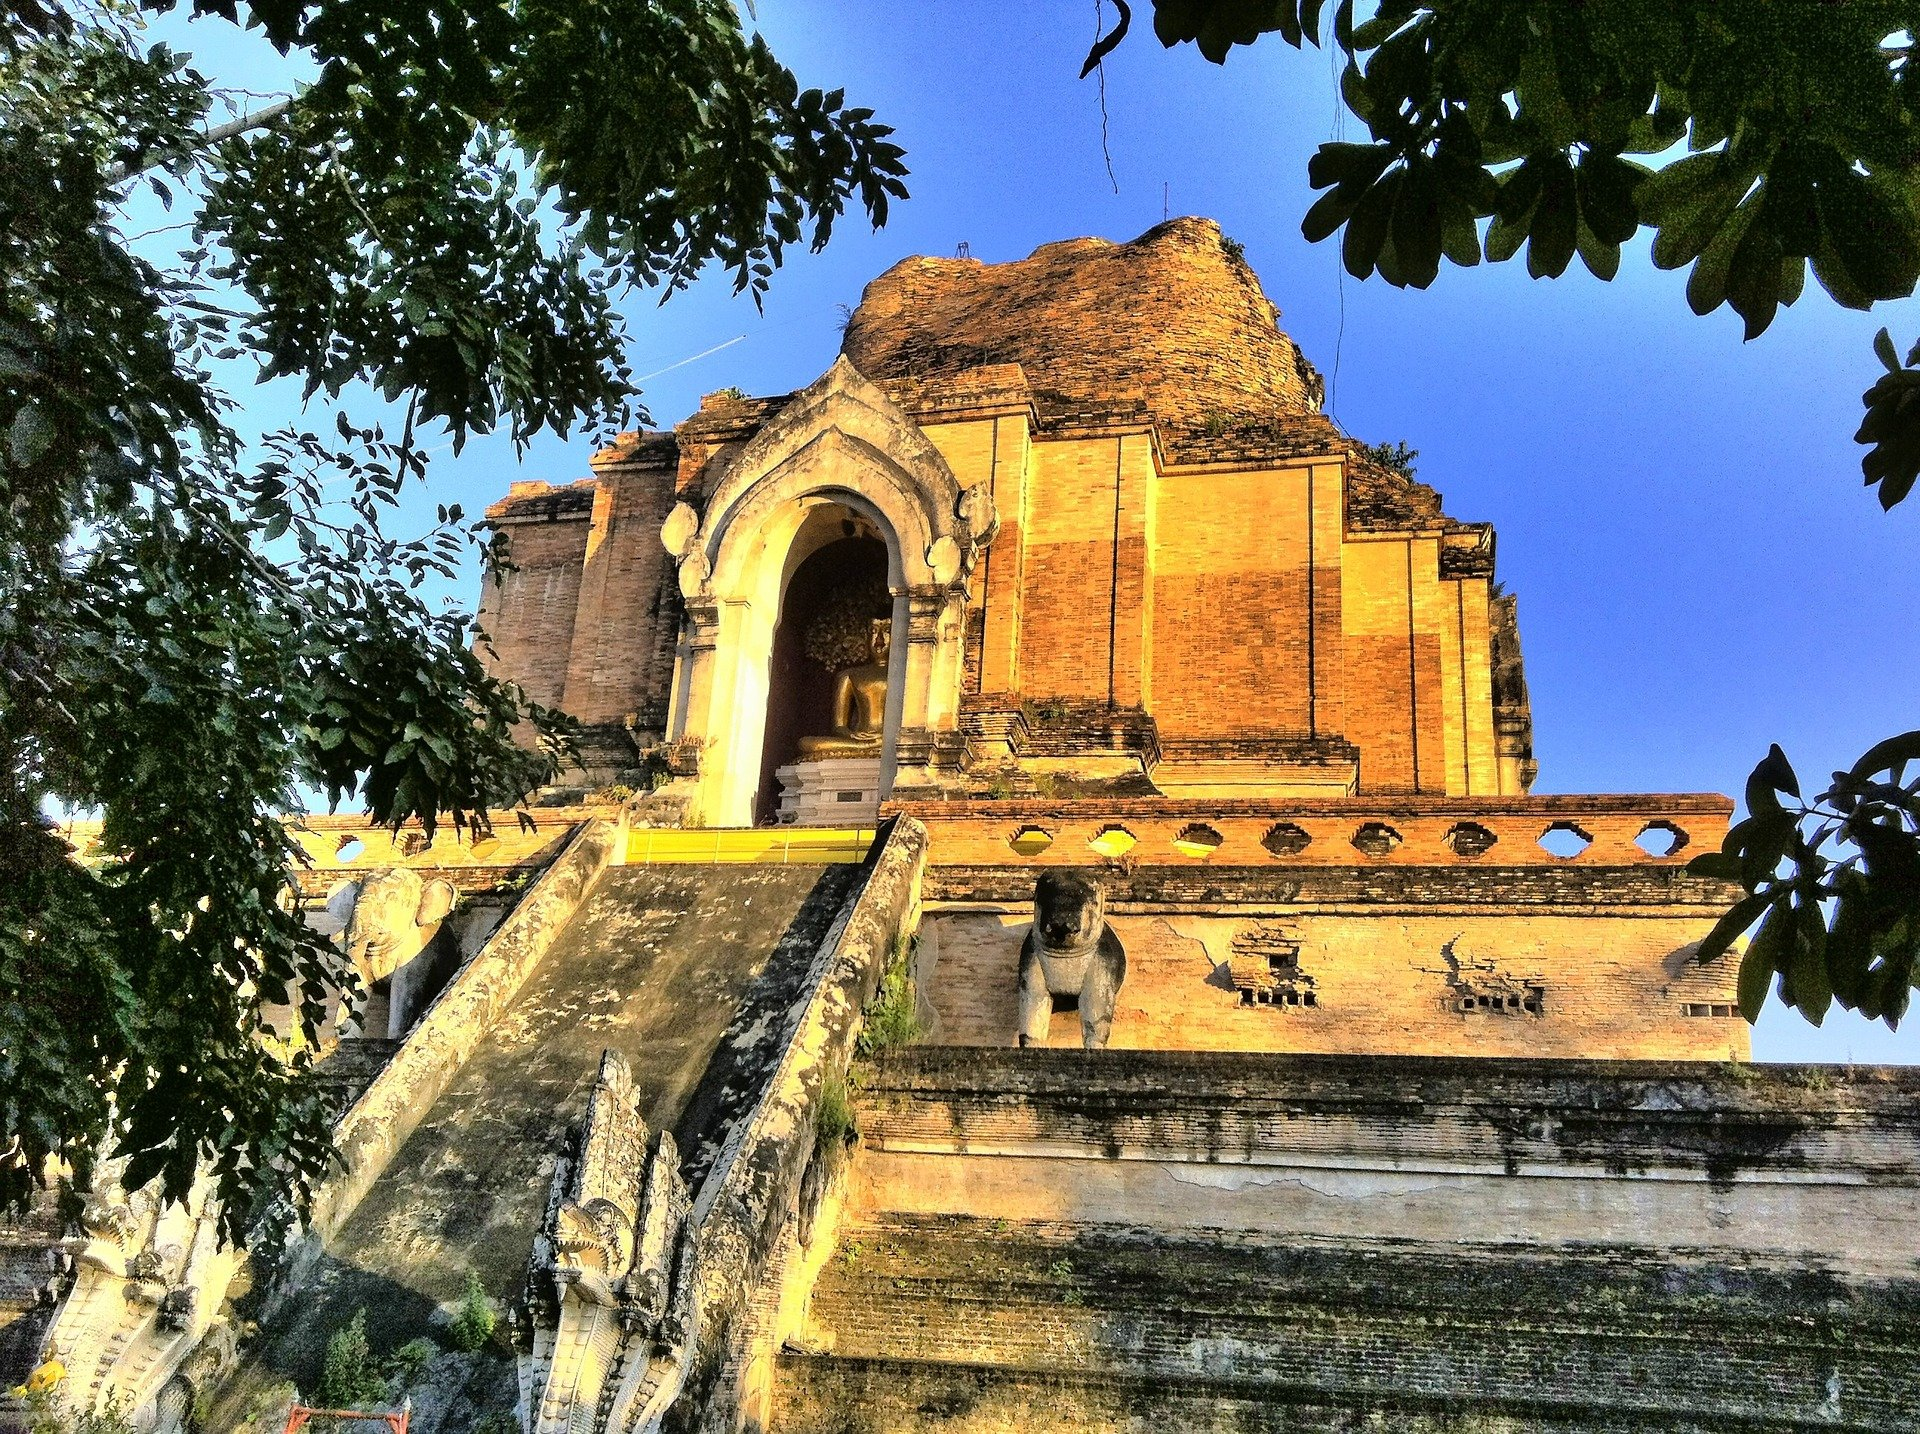 The Great Stupa of Chiang Mai